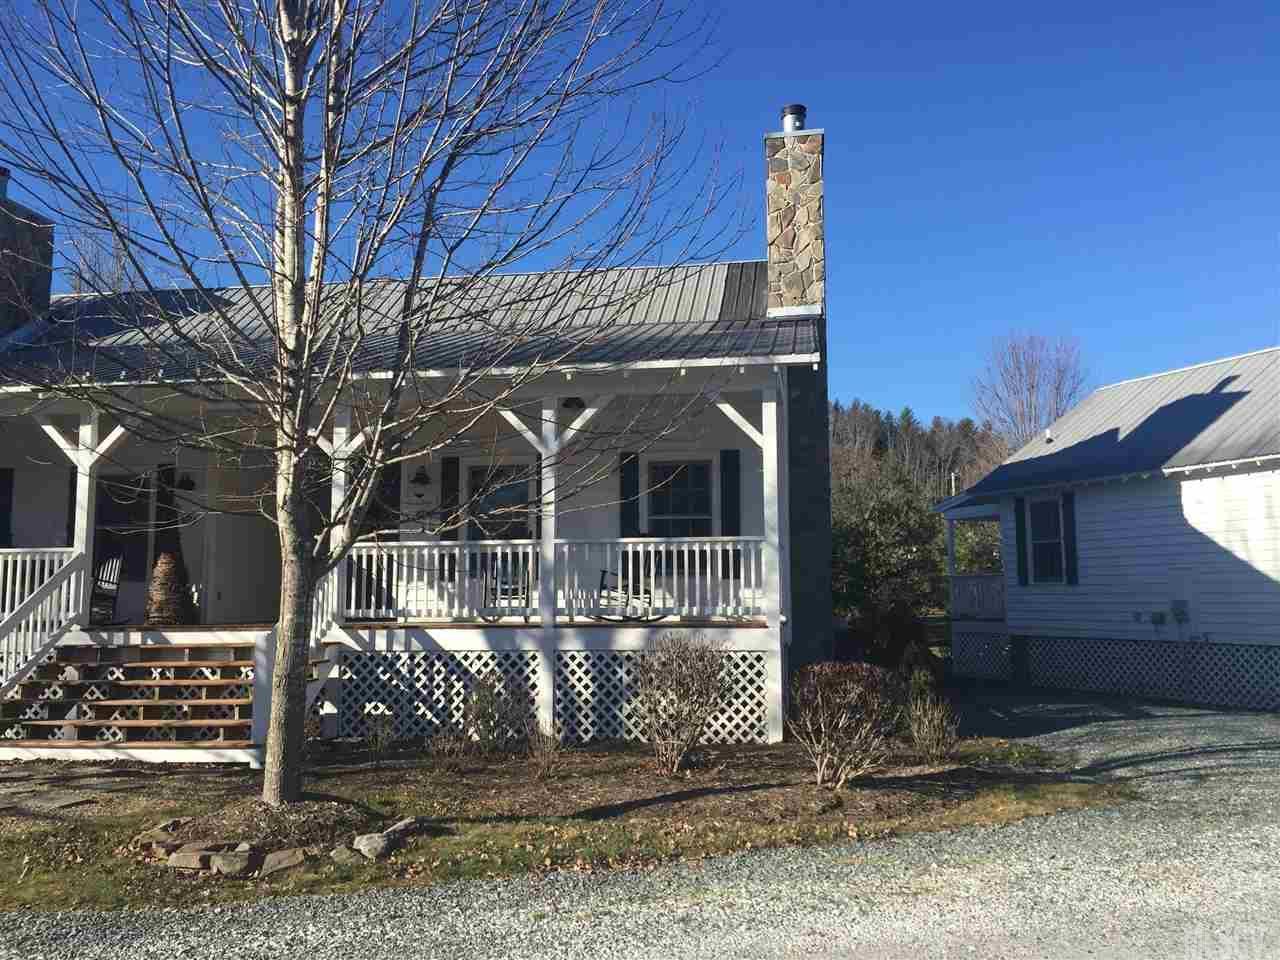 Real Estate for Sale, ListingId: 36960191, Newland,NC28657